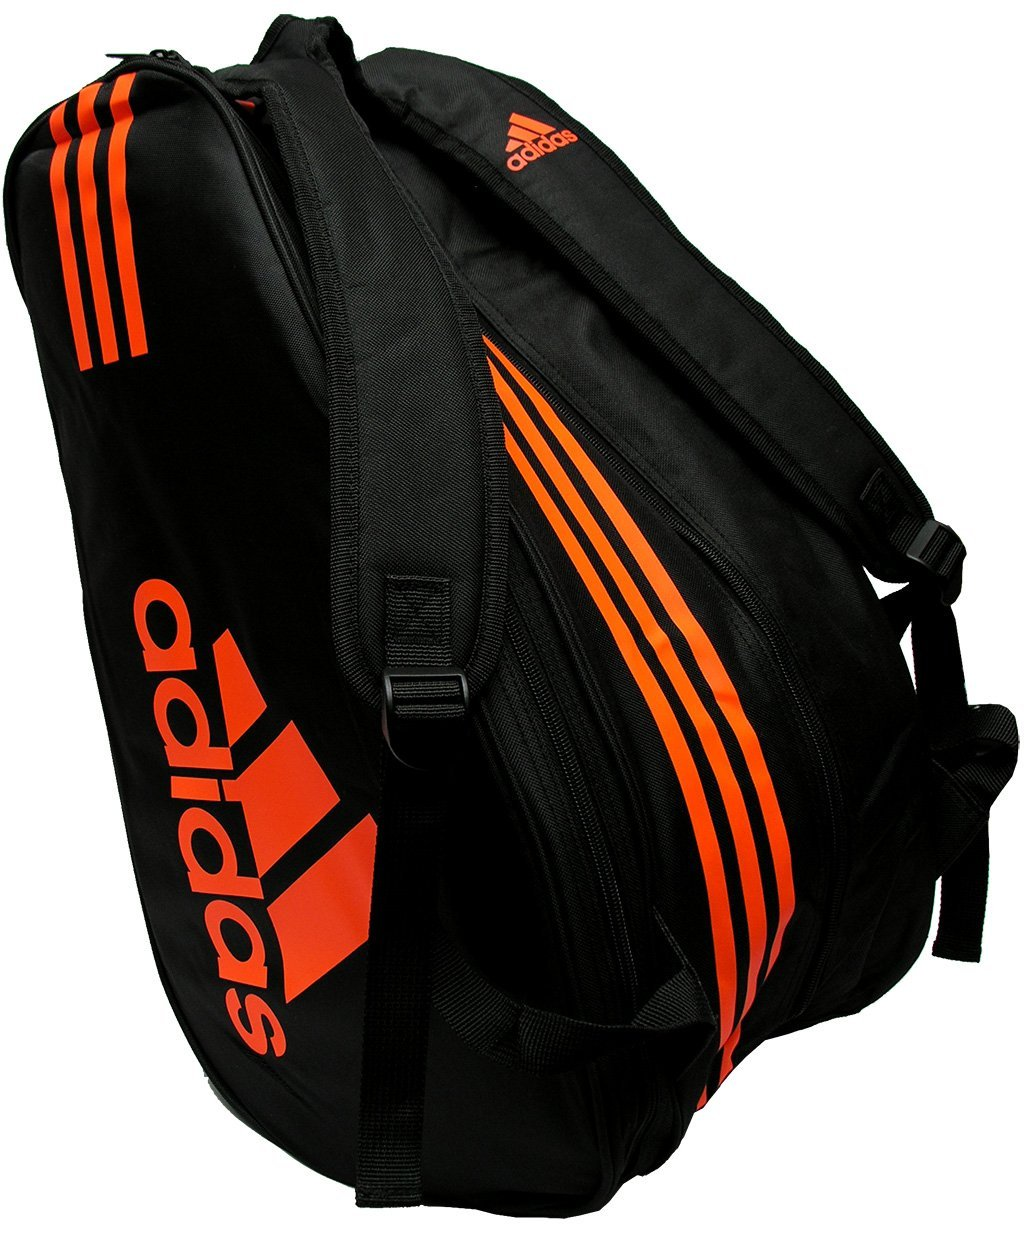 Paletero Adidas Control Orange 2016